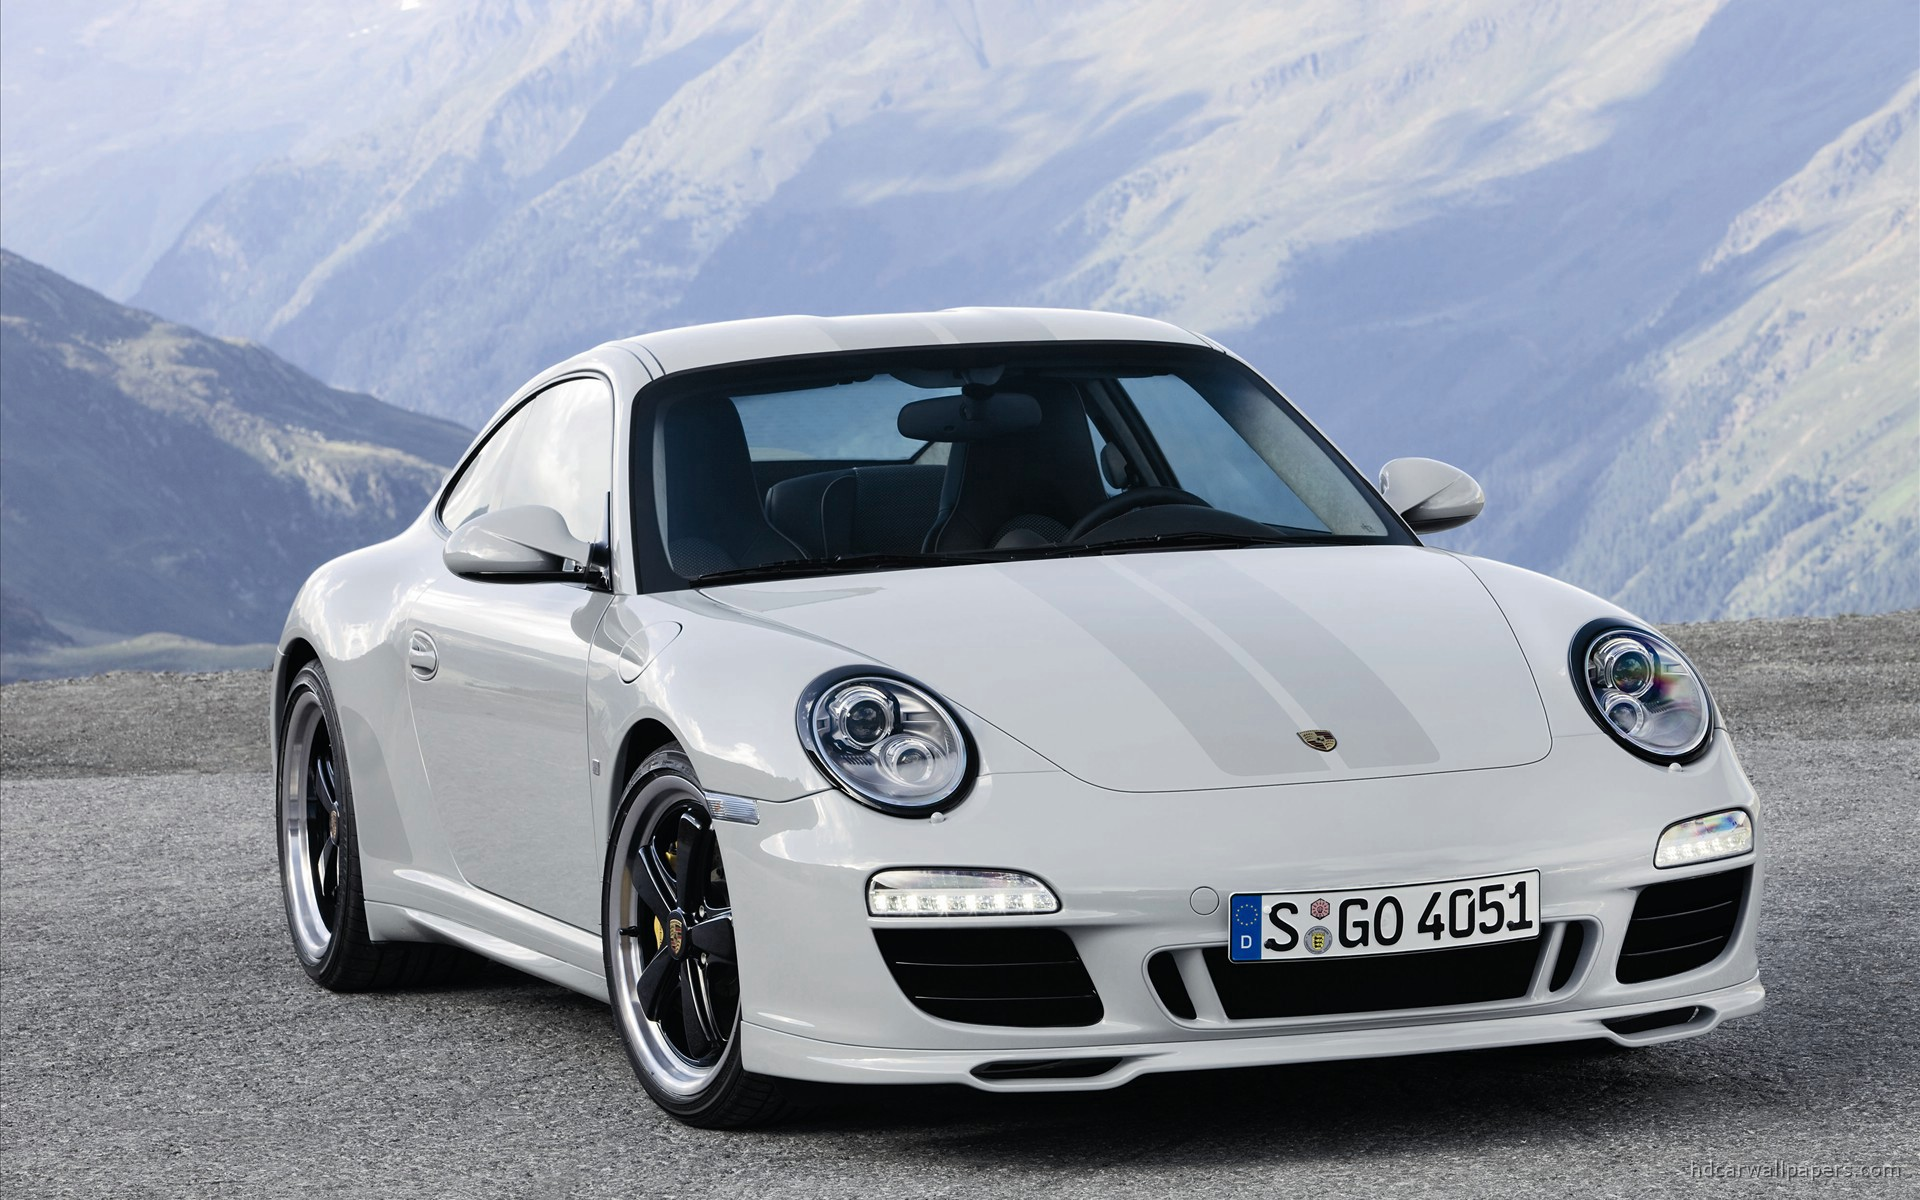 Porsche Cars Blue Porsche Blue Porsche Cars